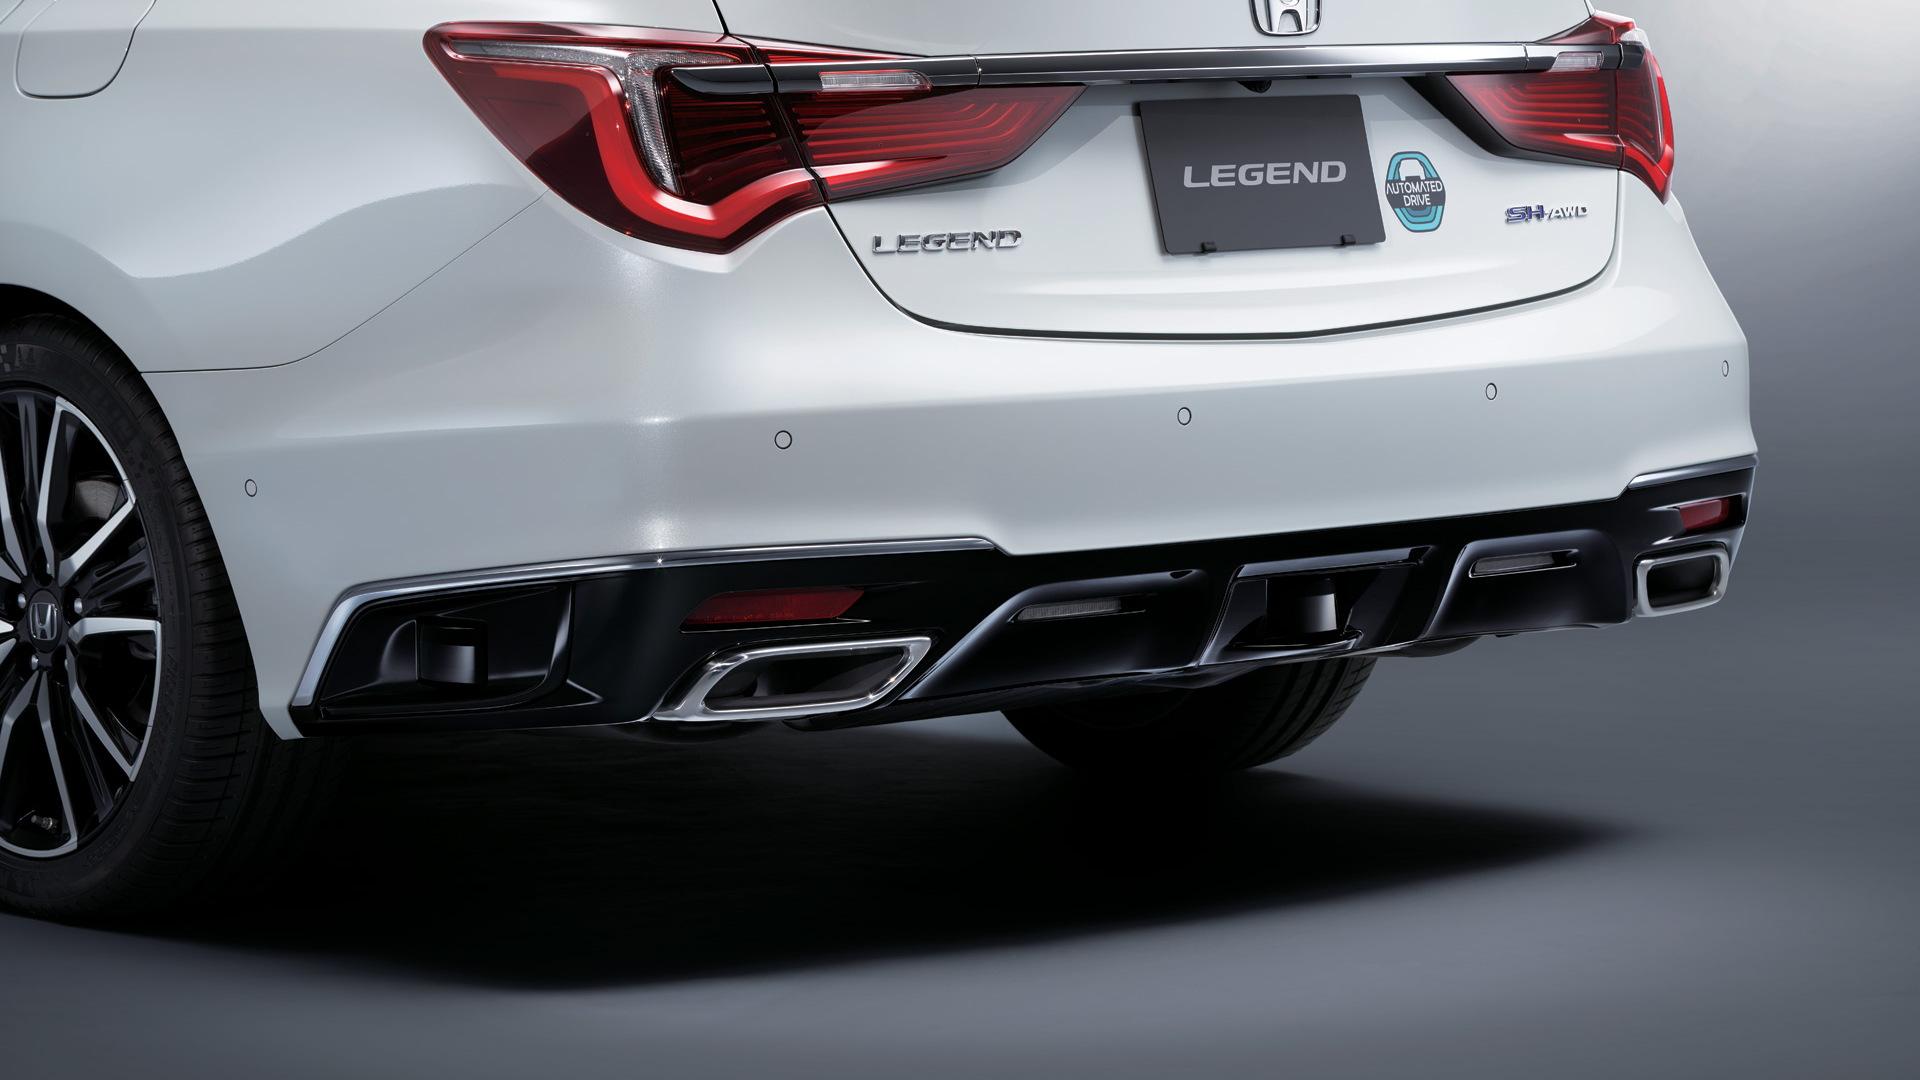 2021 Honda Legend (Japanese spec)